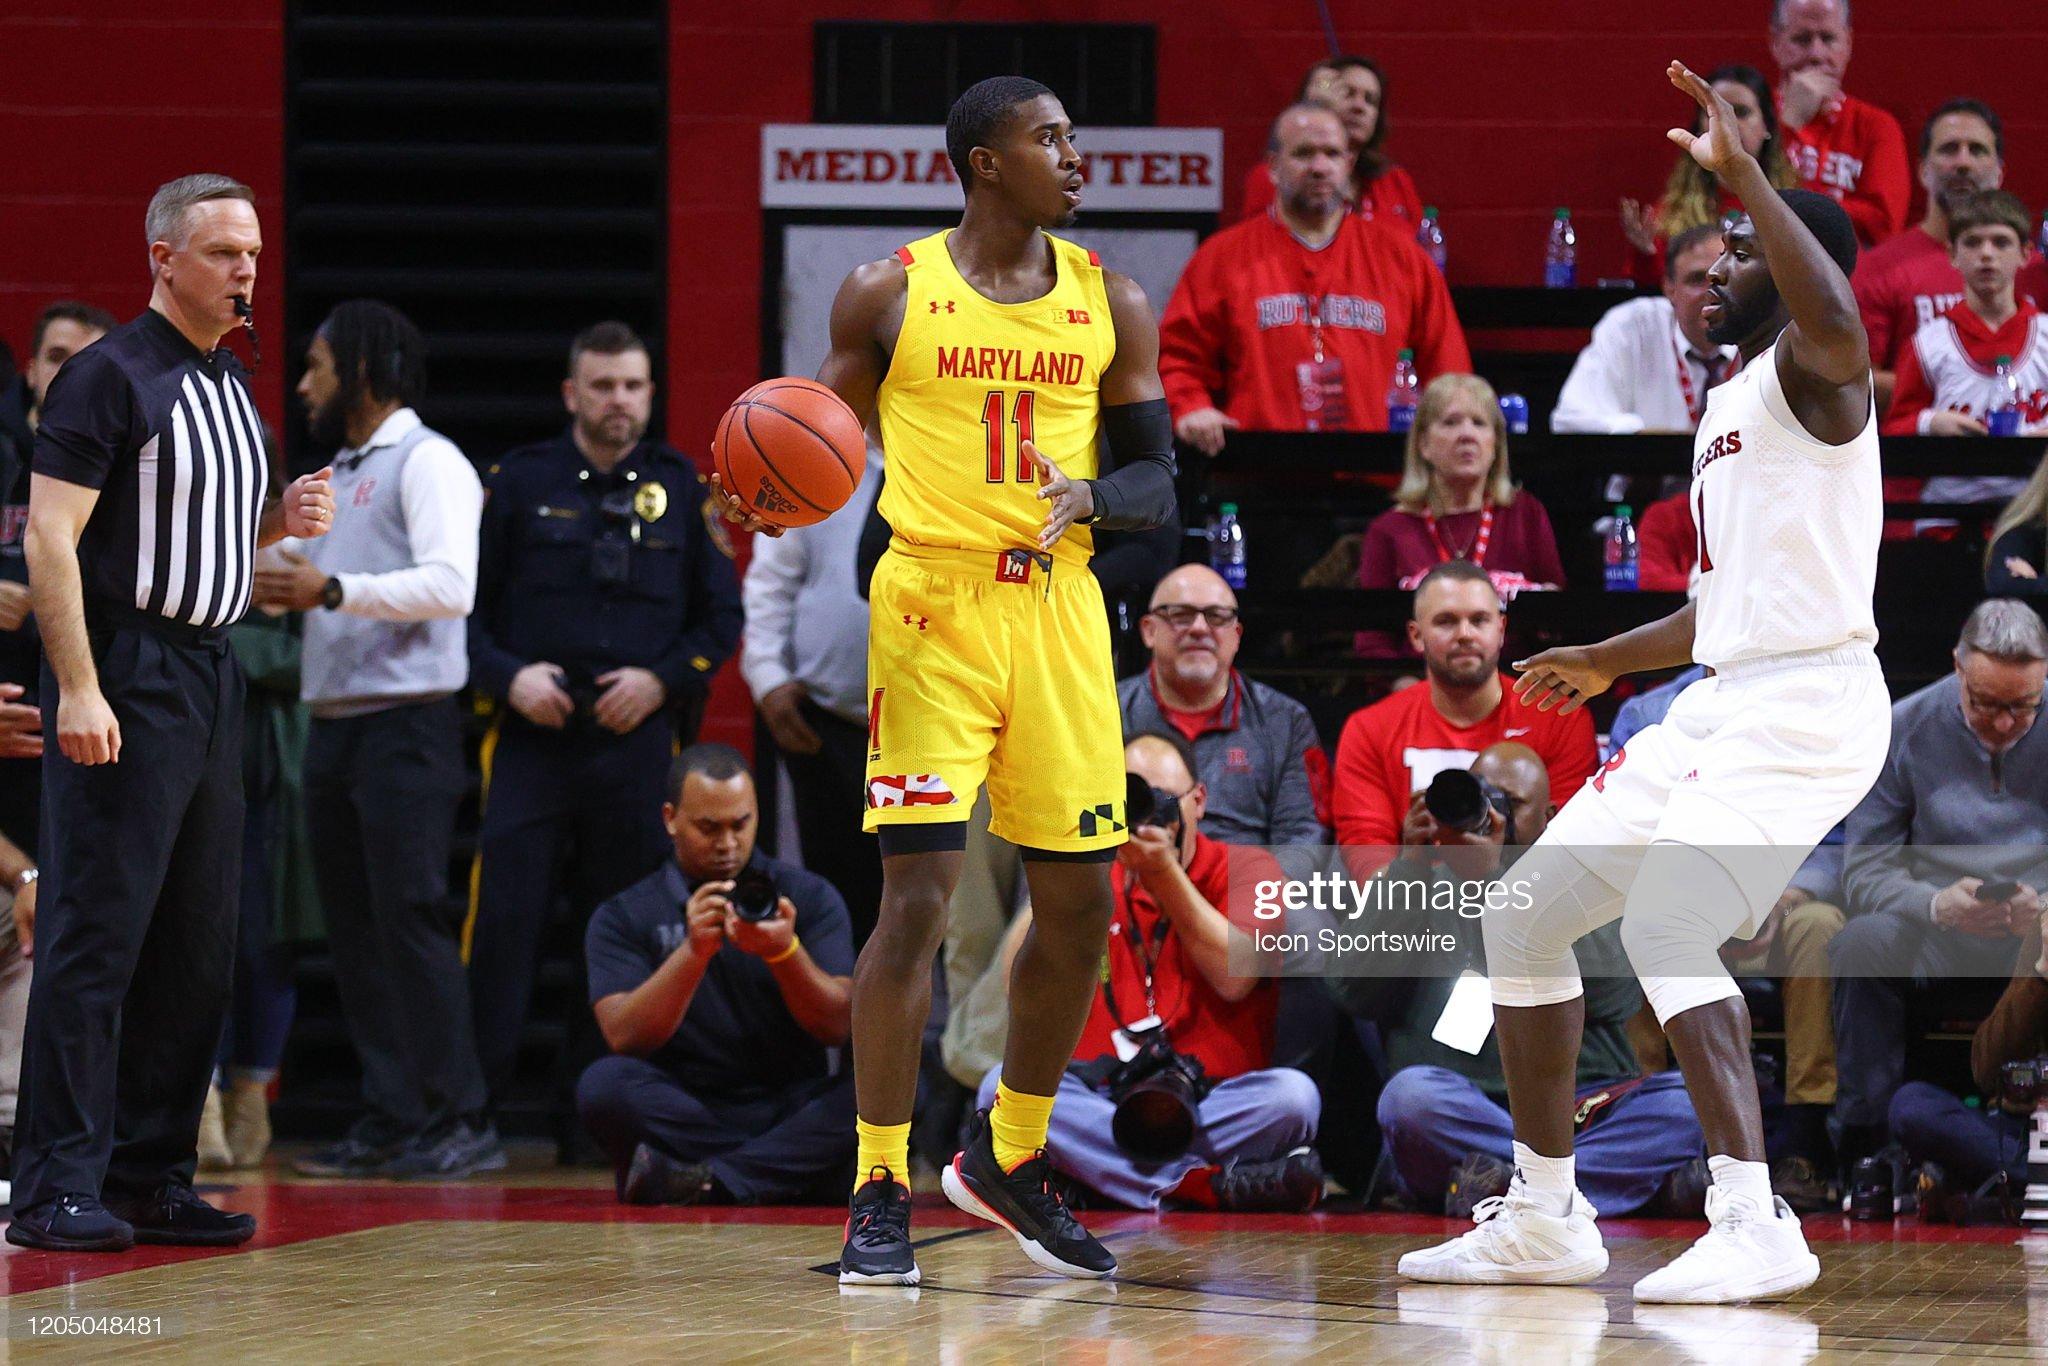 COLLEGE BASKETBALL: MAR 03 Maryland at Rutgers : Nachrichtenfoto